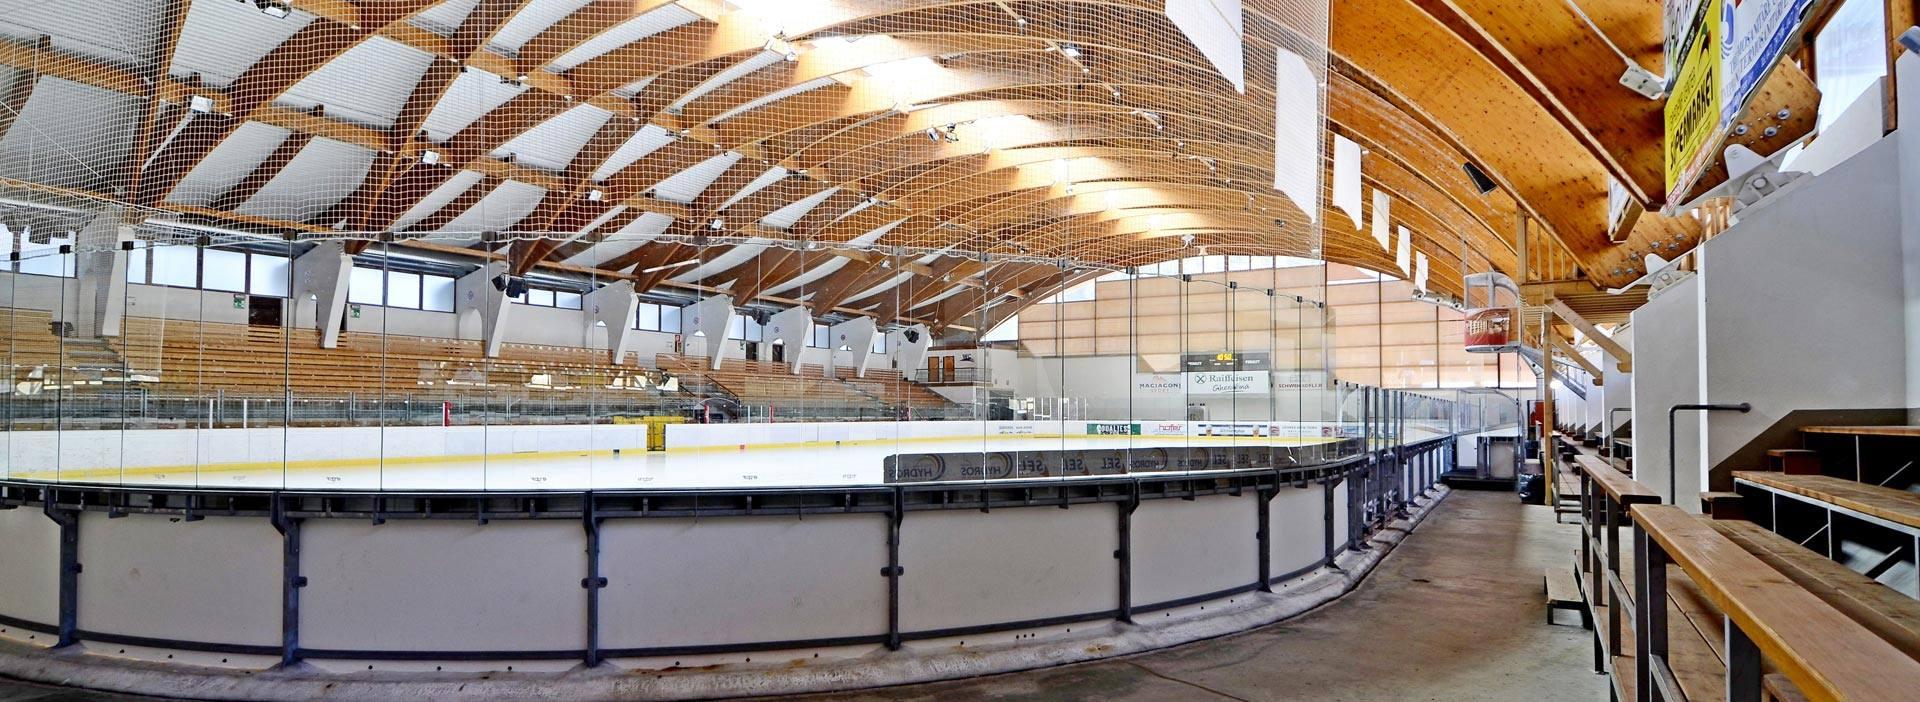 Stadio del ghiaccio Pranives